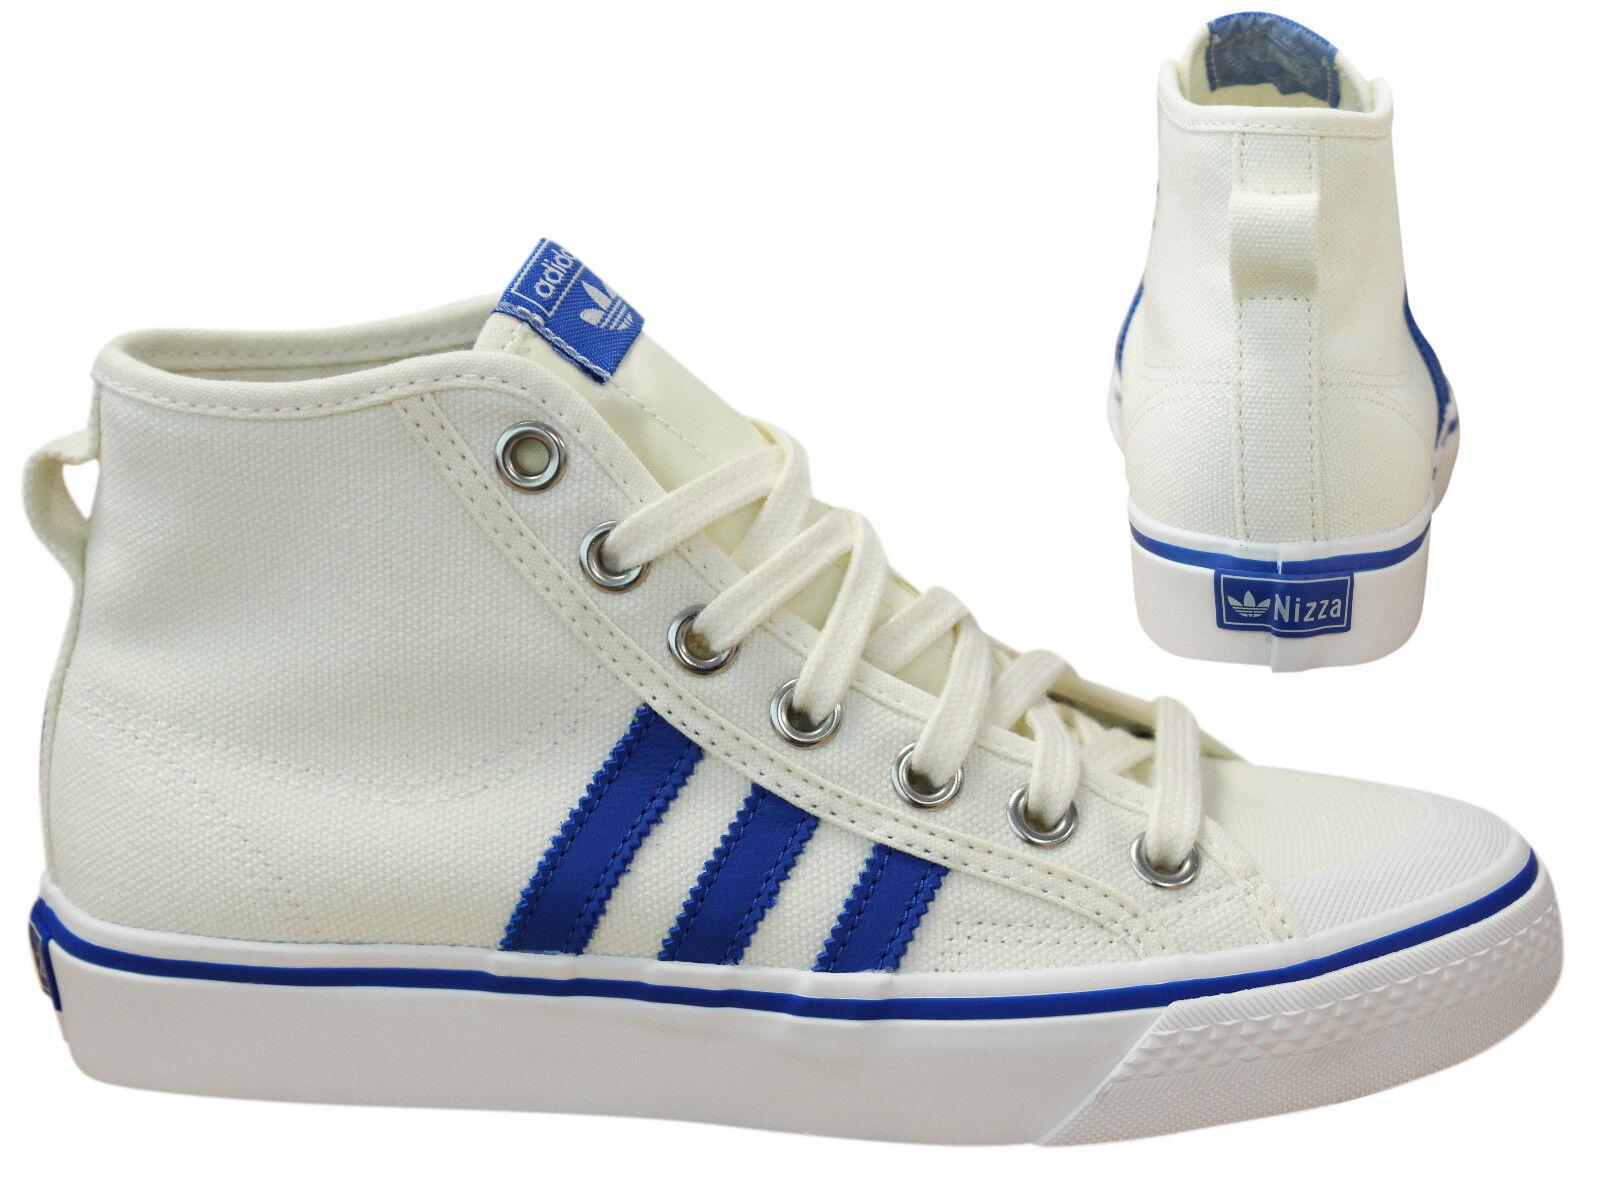 Adidas Originals Nizza Hi Mens Womens Trainers Lace Up shoes Cream BZ0543 D82